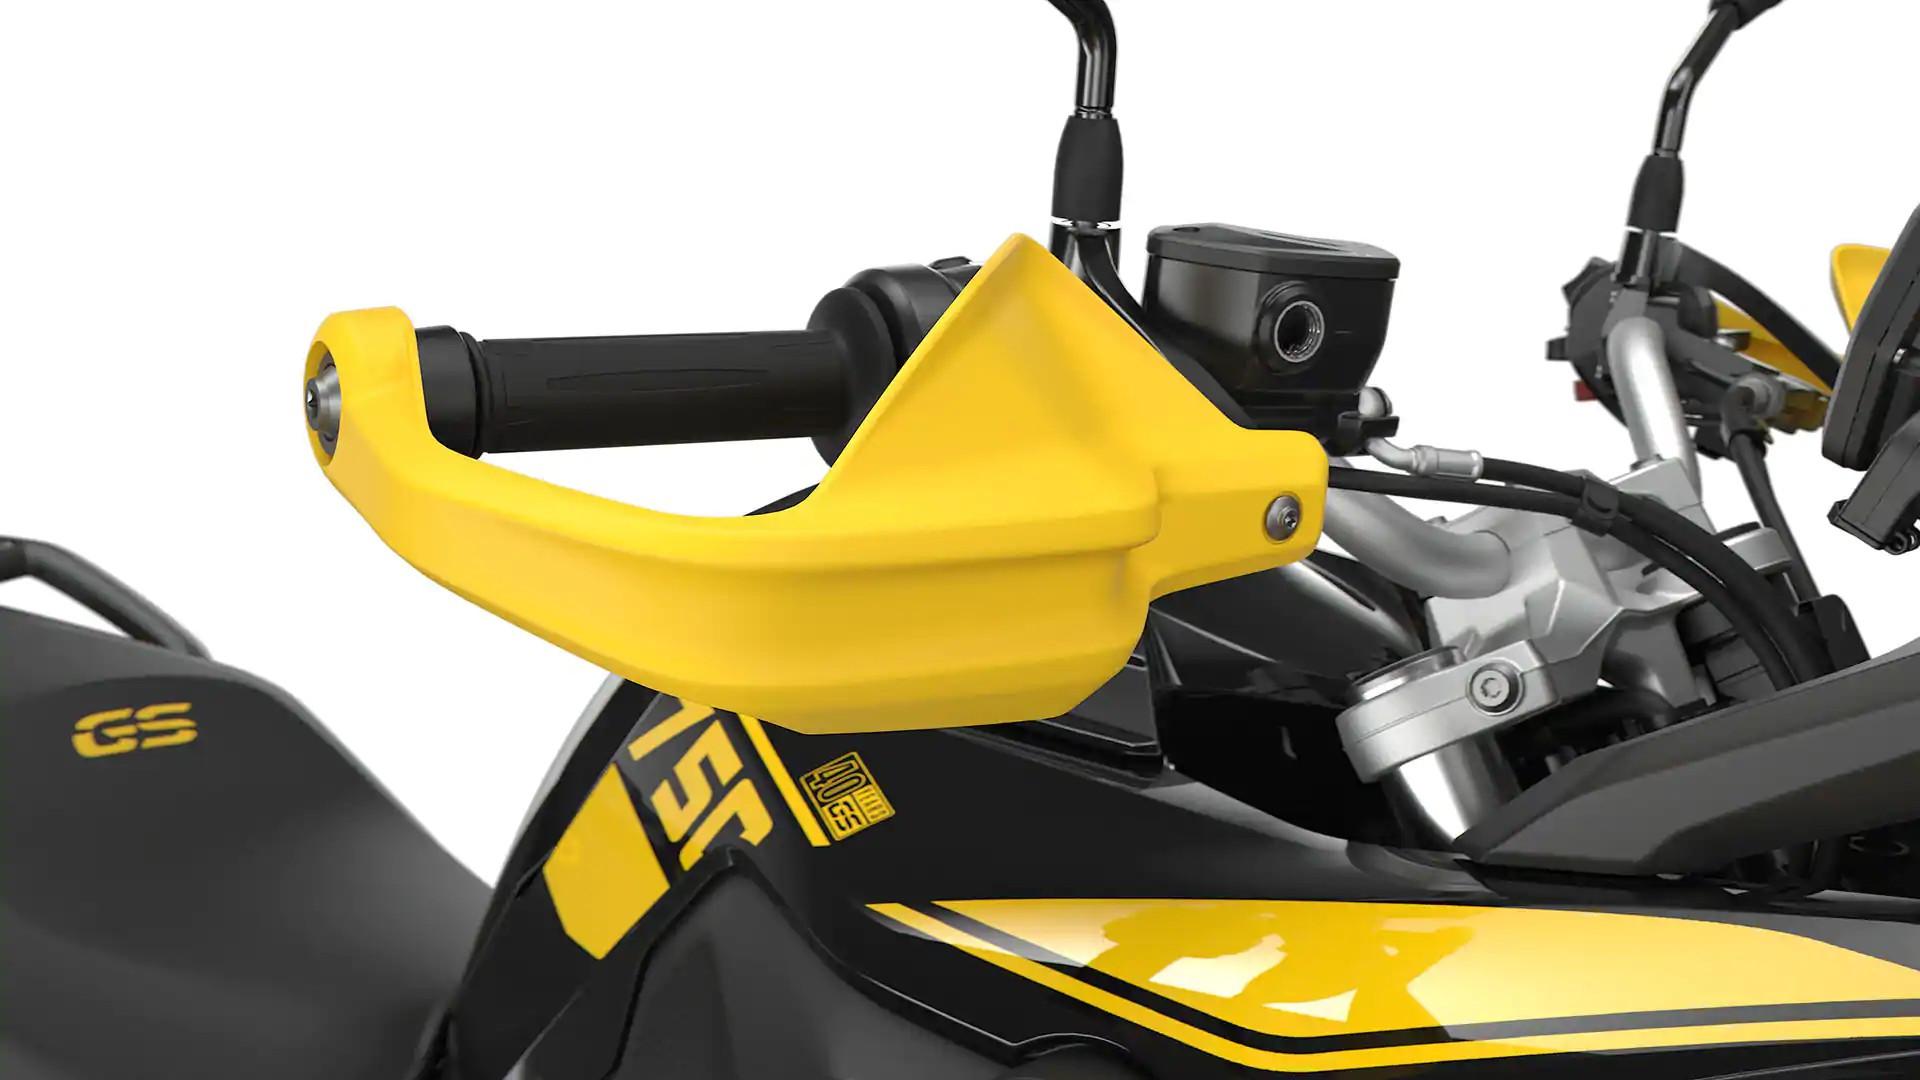 Захист рук жовтого кольору